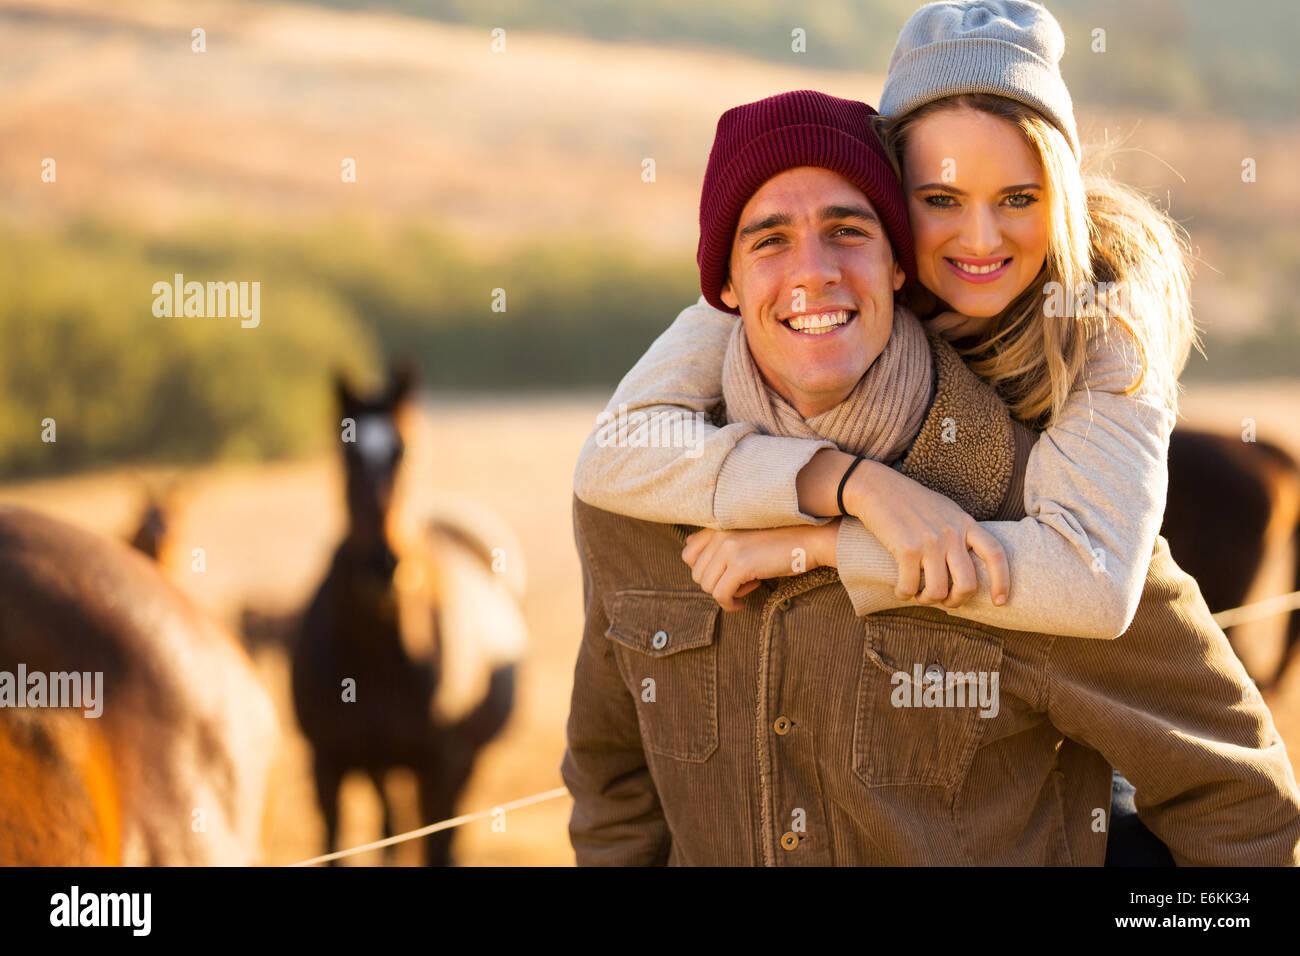 Happy woman piggyback ride on boyfriends back Photo Stock